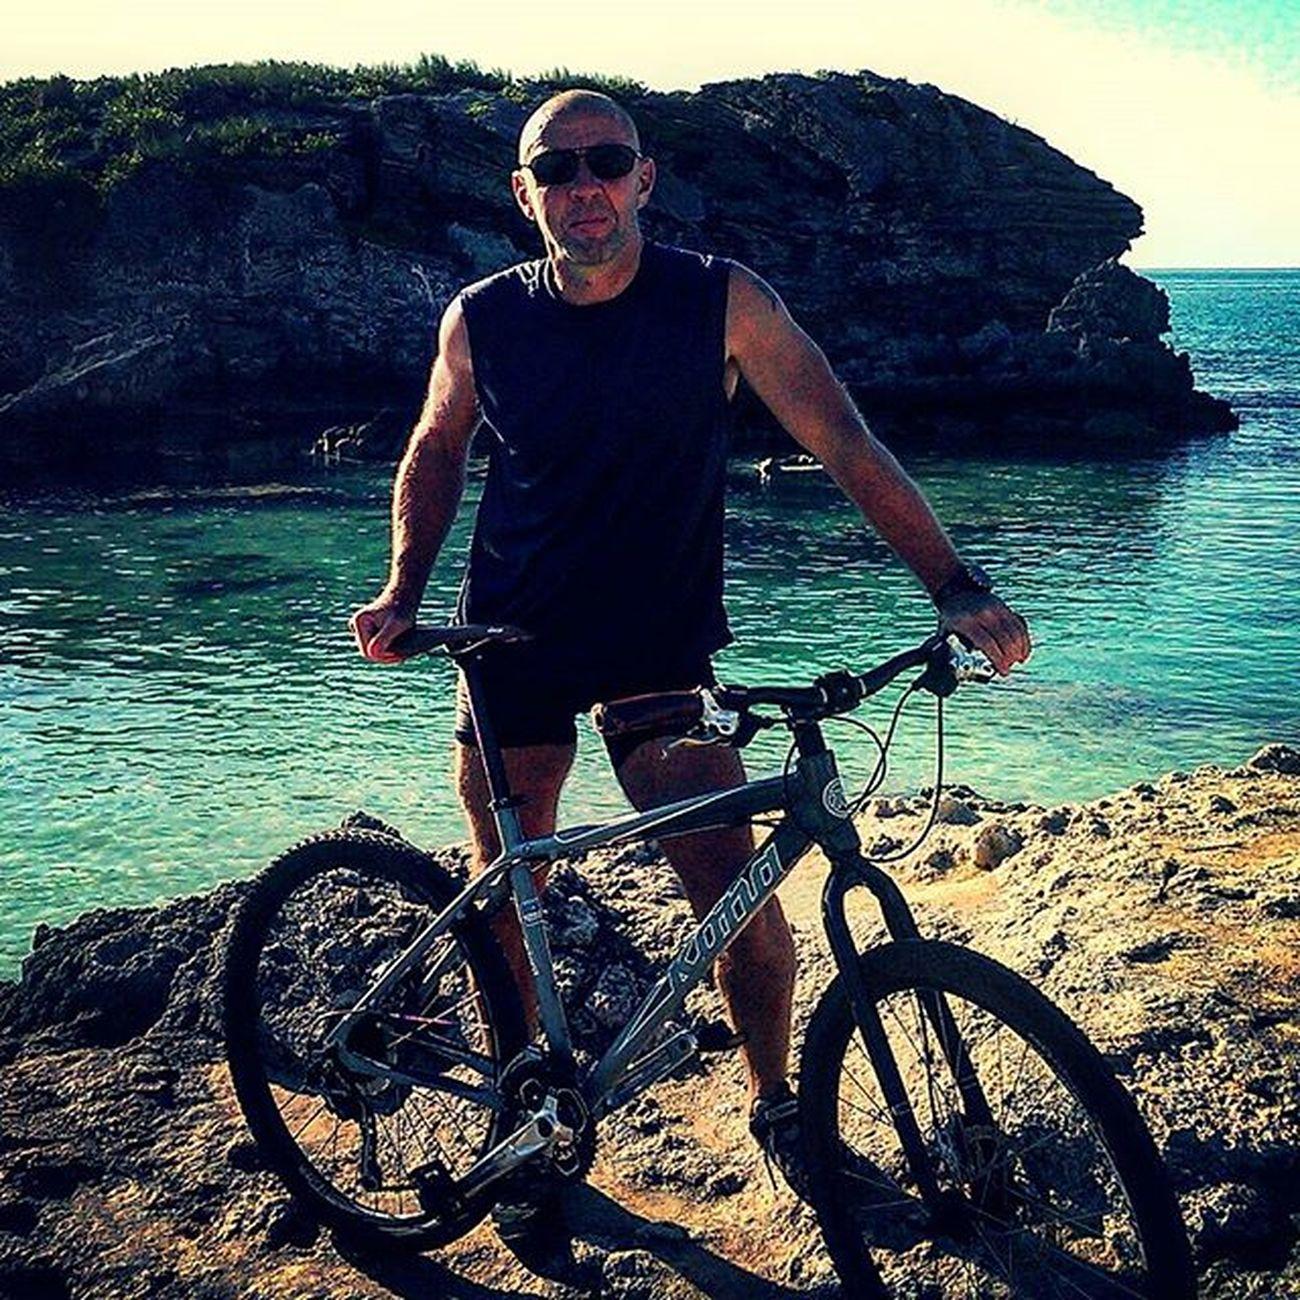 Cycling Novembersun Tobaccobay Bermudas Bermuda Islandlife Stgeorge